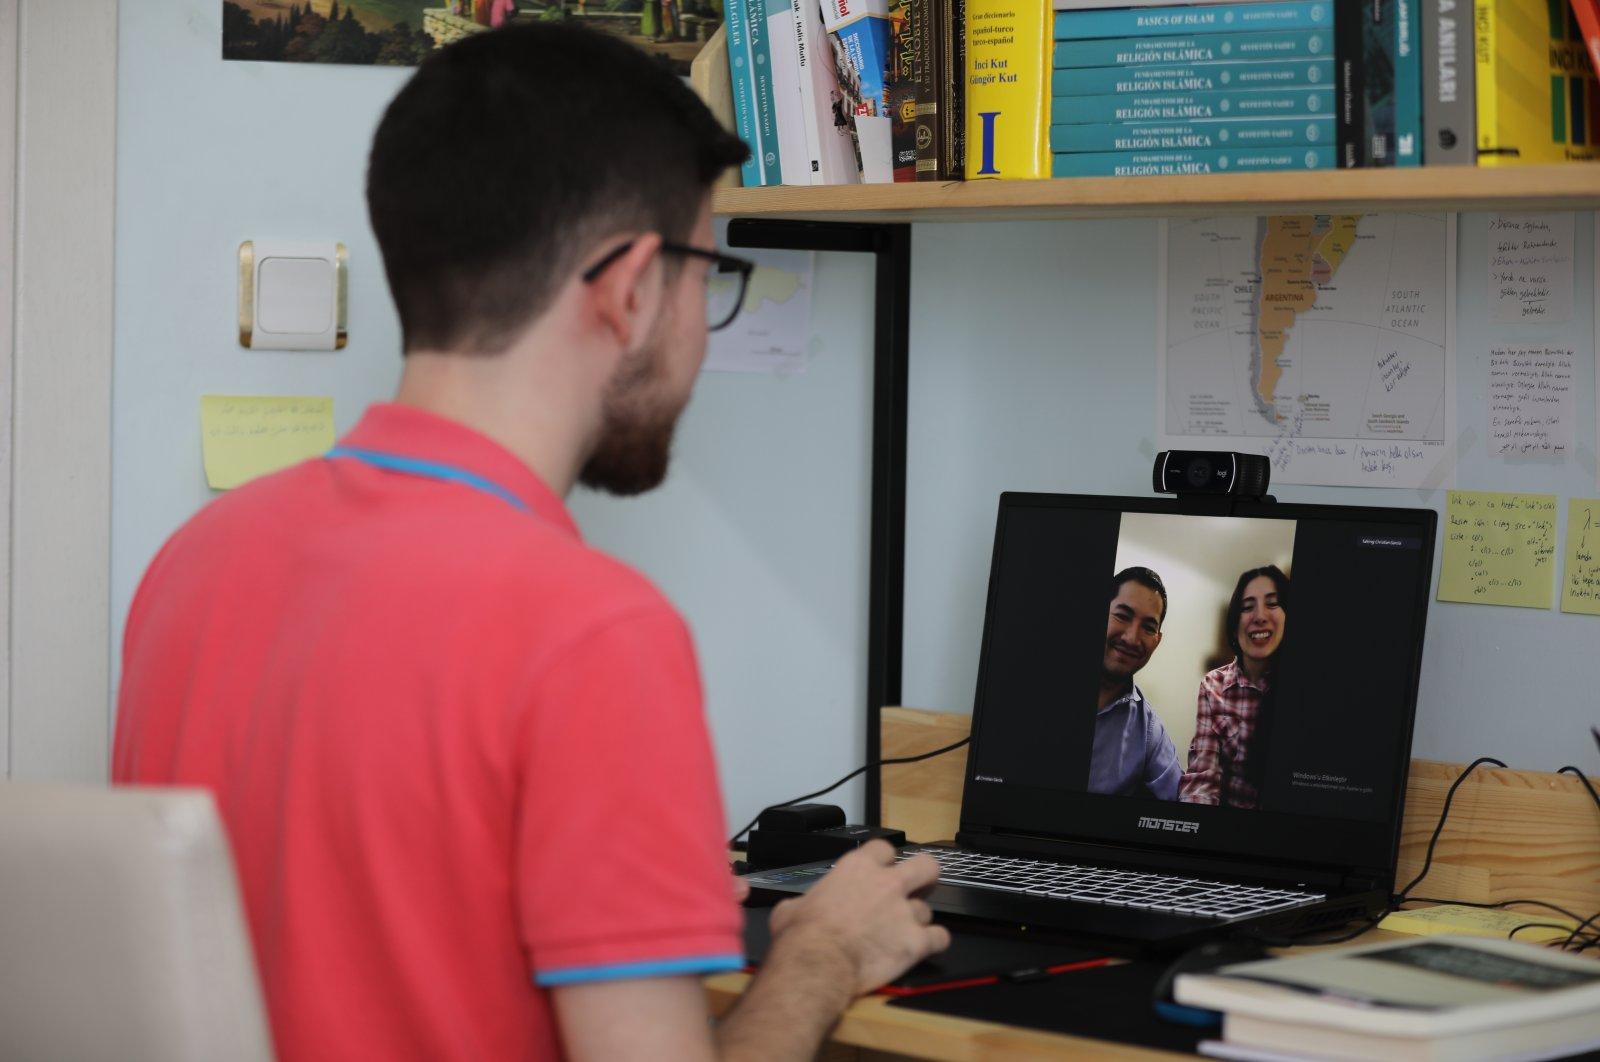 Muhammed Bilal Özyüksel talk to his Spanish-speaking students in an online class, in Istanbul, Turkey, June 22, 2021. (AA PHOTO)